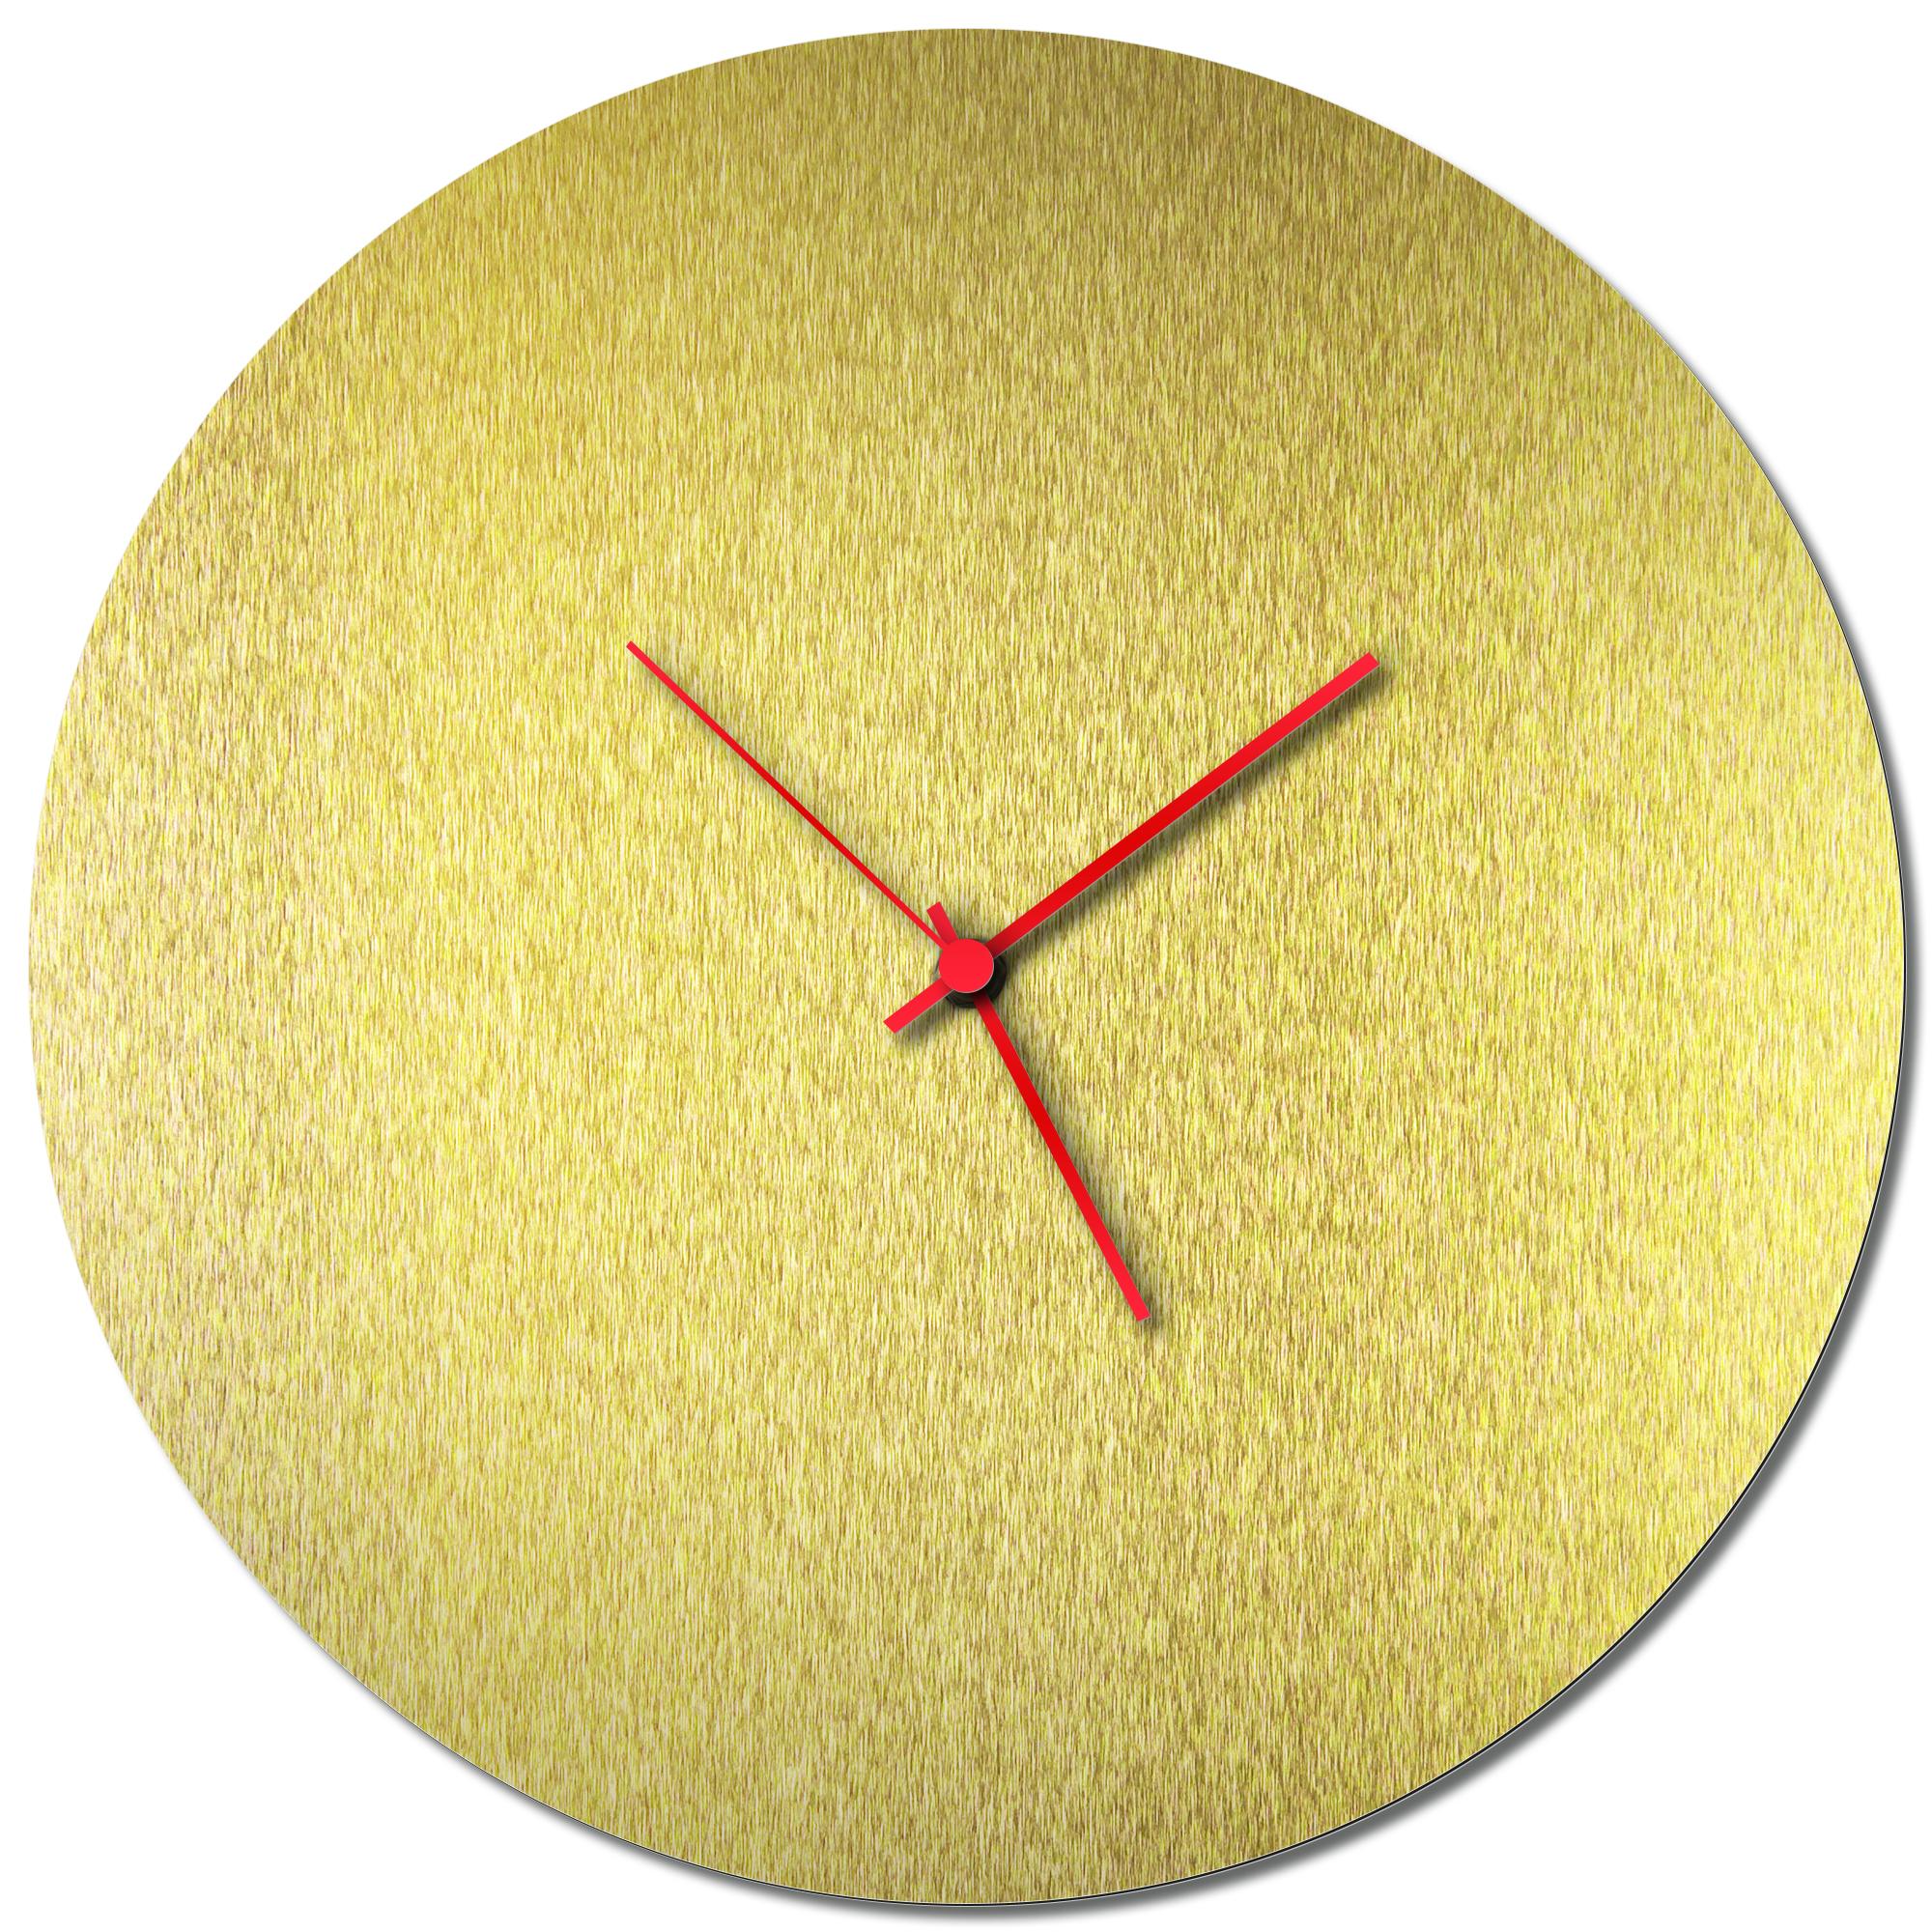 Adam Schwoeppe 'Goldsmith Circle Clock Red' Midcentury Modern Style Wall Clock